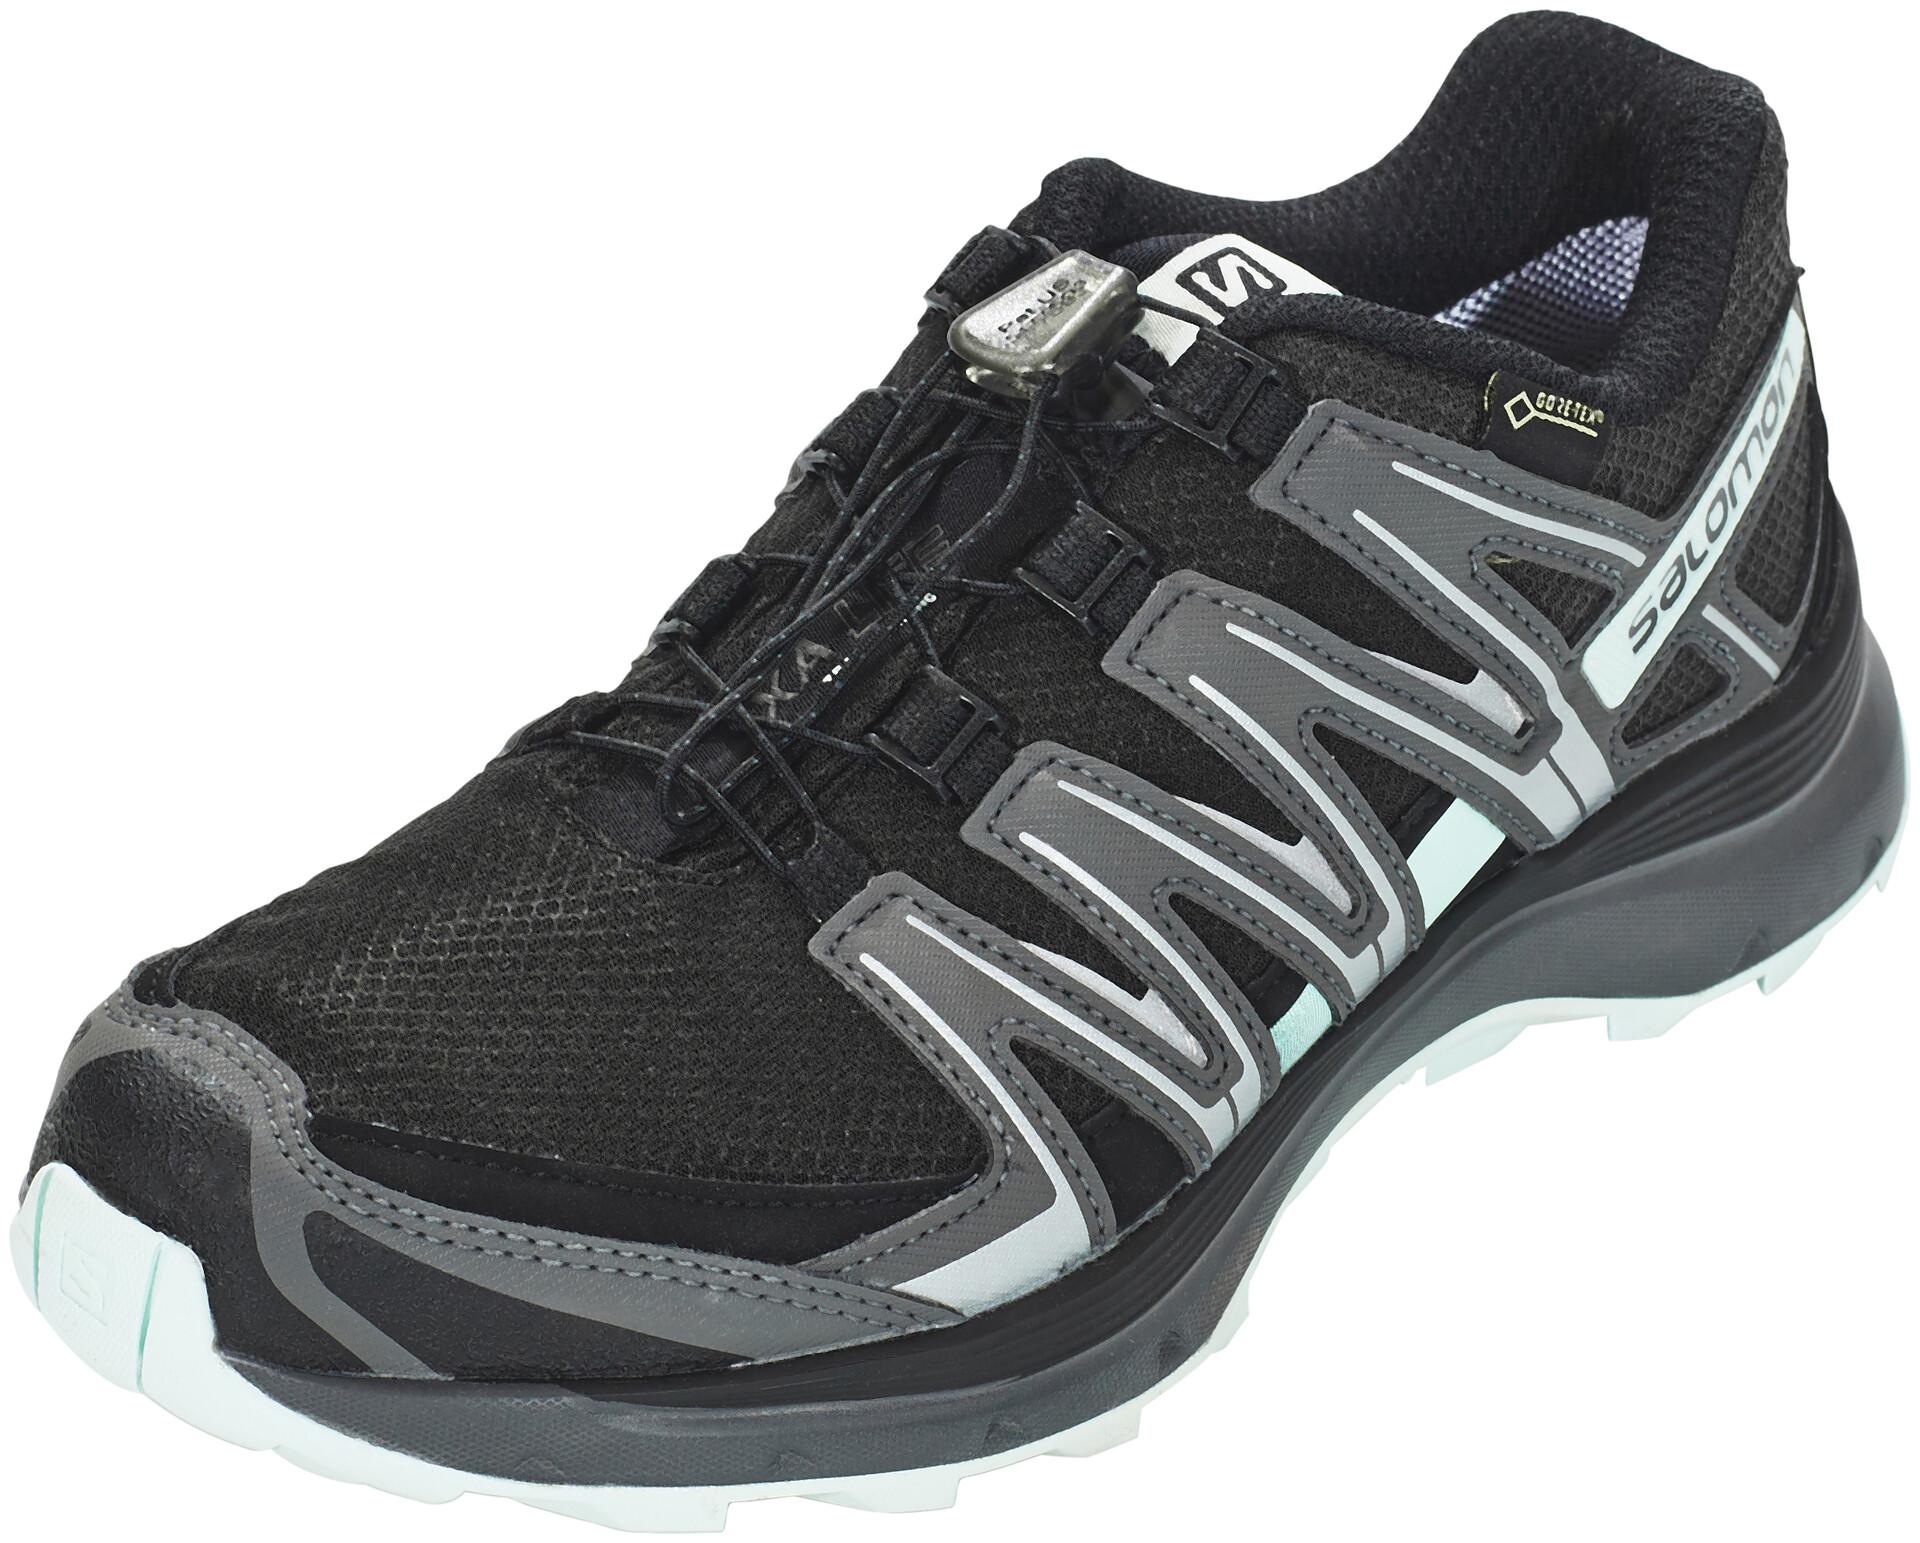 Salomon XA Lite GTX Trailrunning Shoes Dame blackmagnetfair aqua